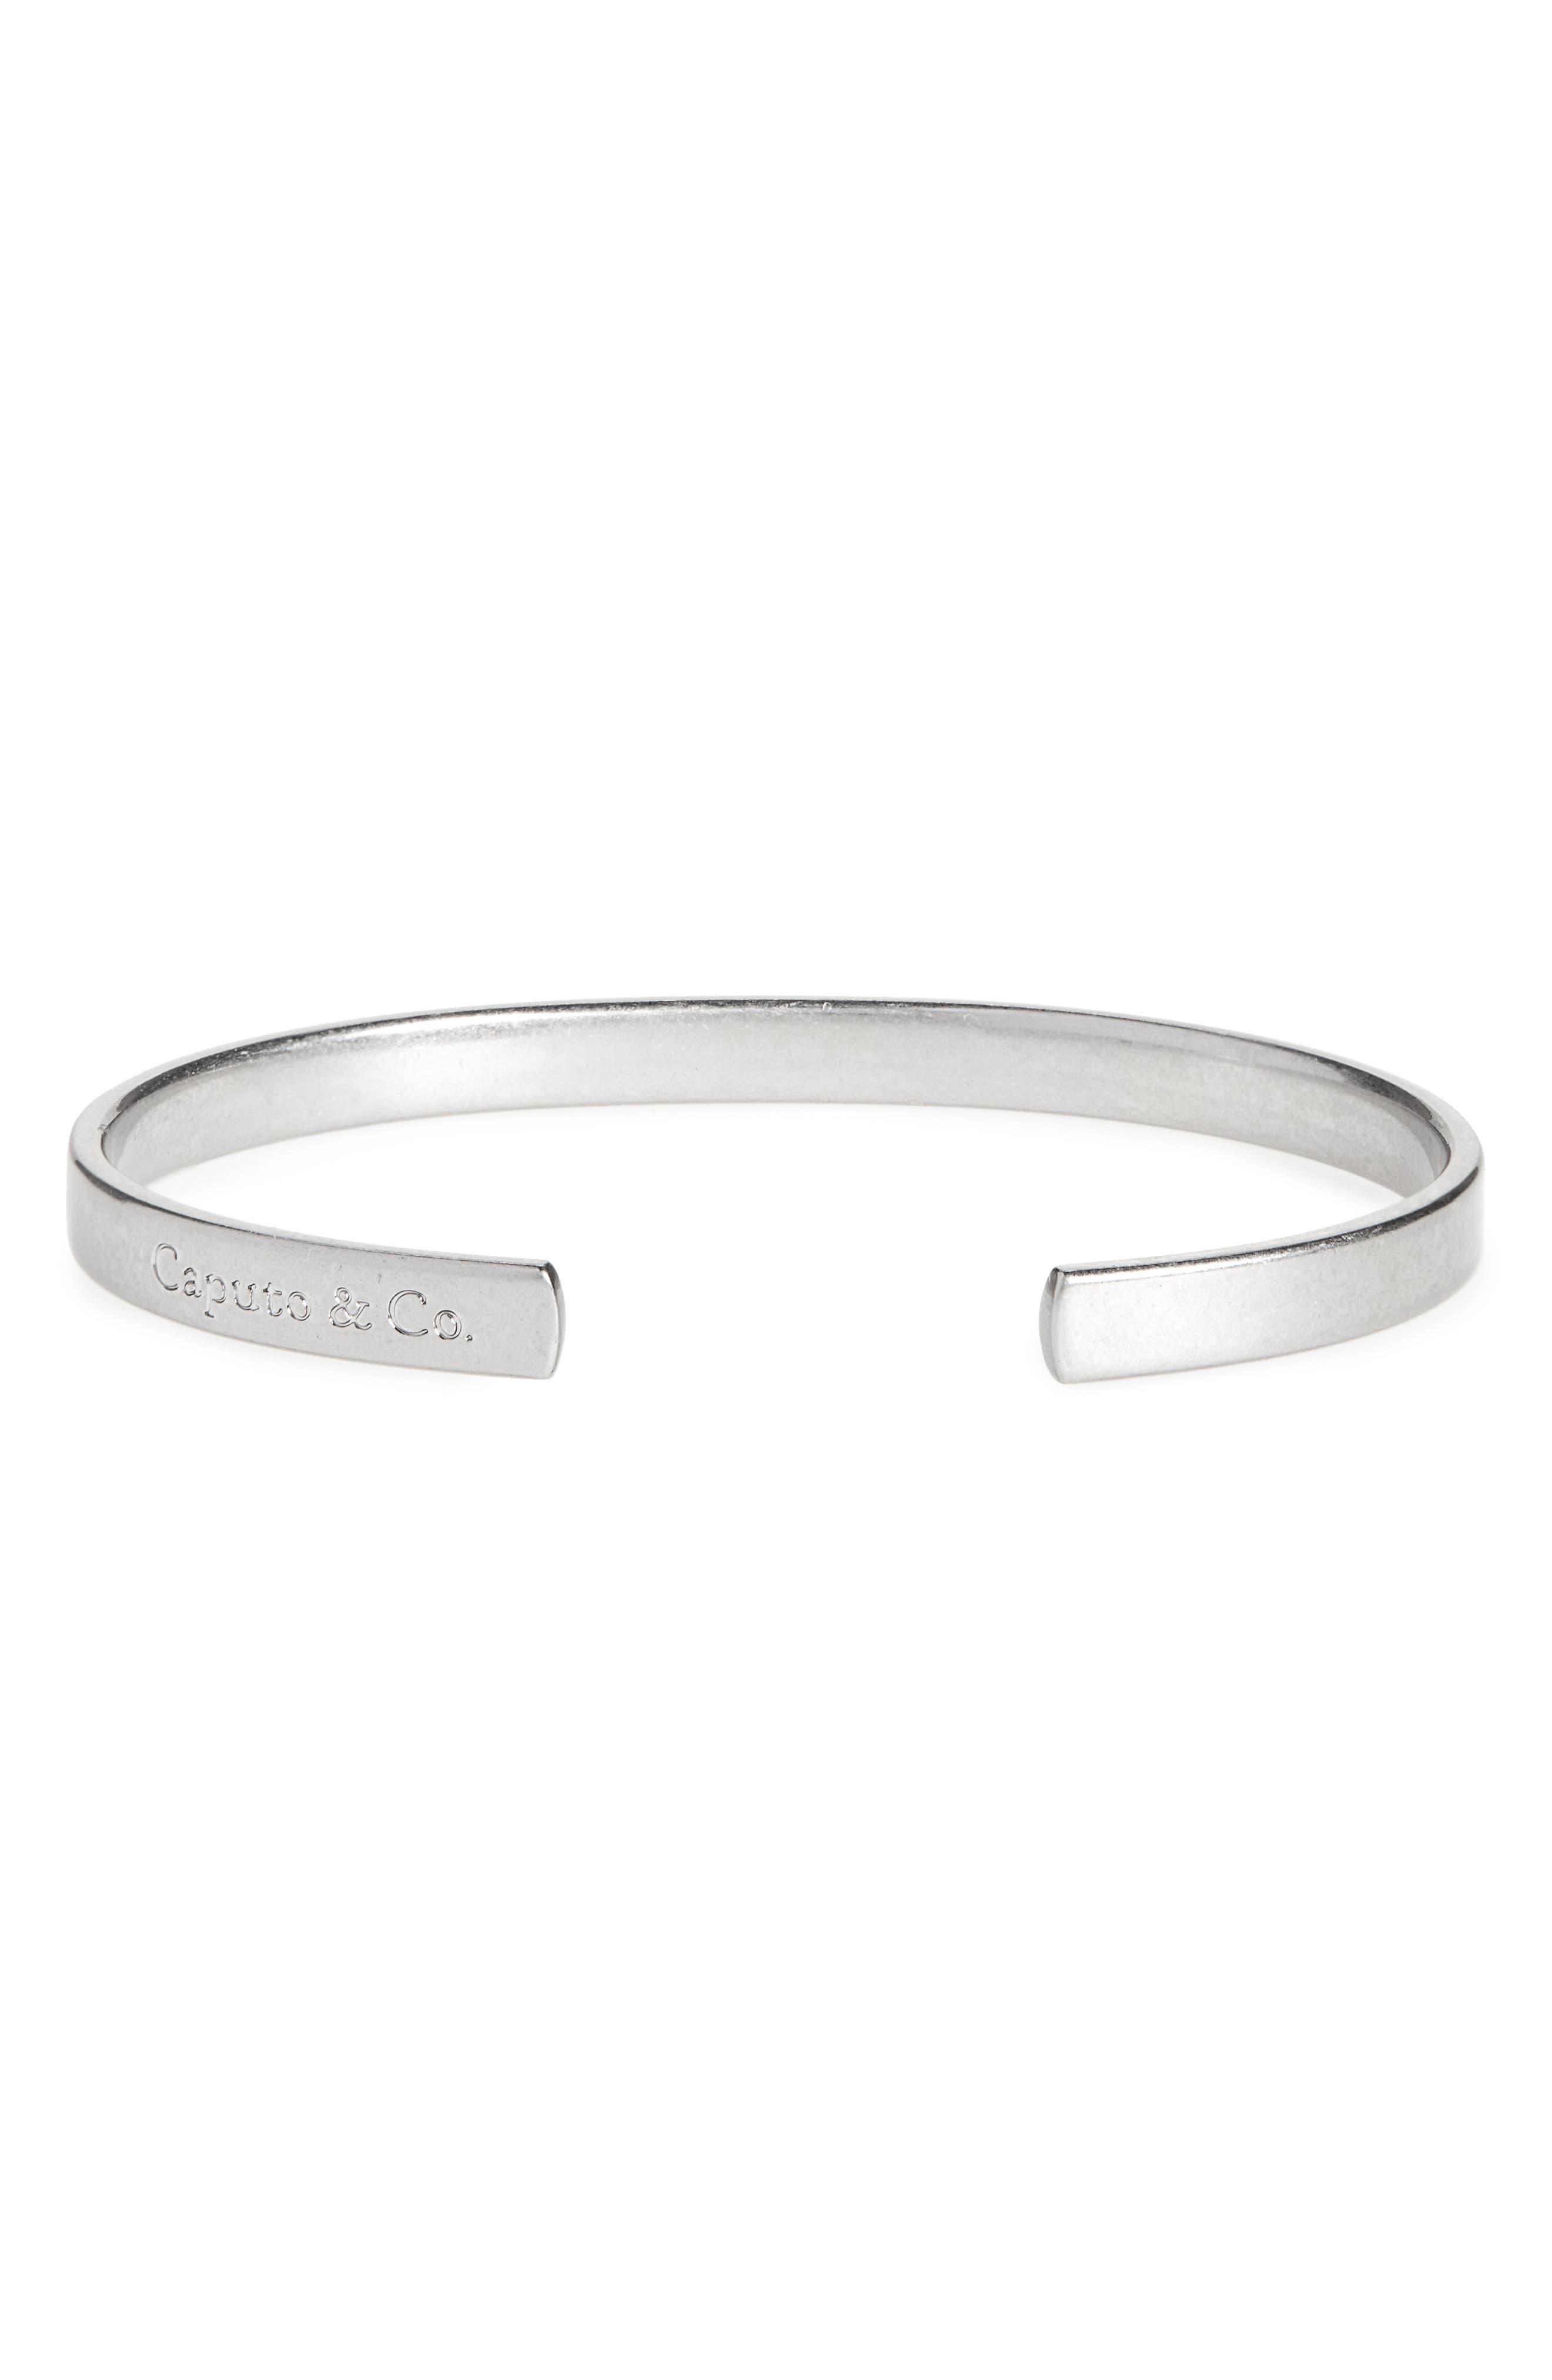 CAPUTO & CO. Clean Metal Cuff Bracelet in Brown